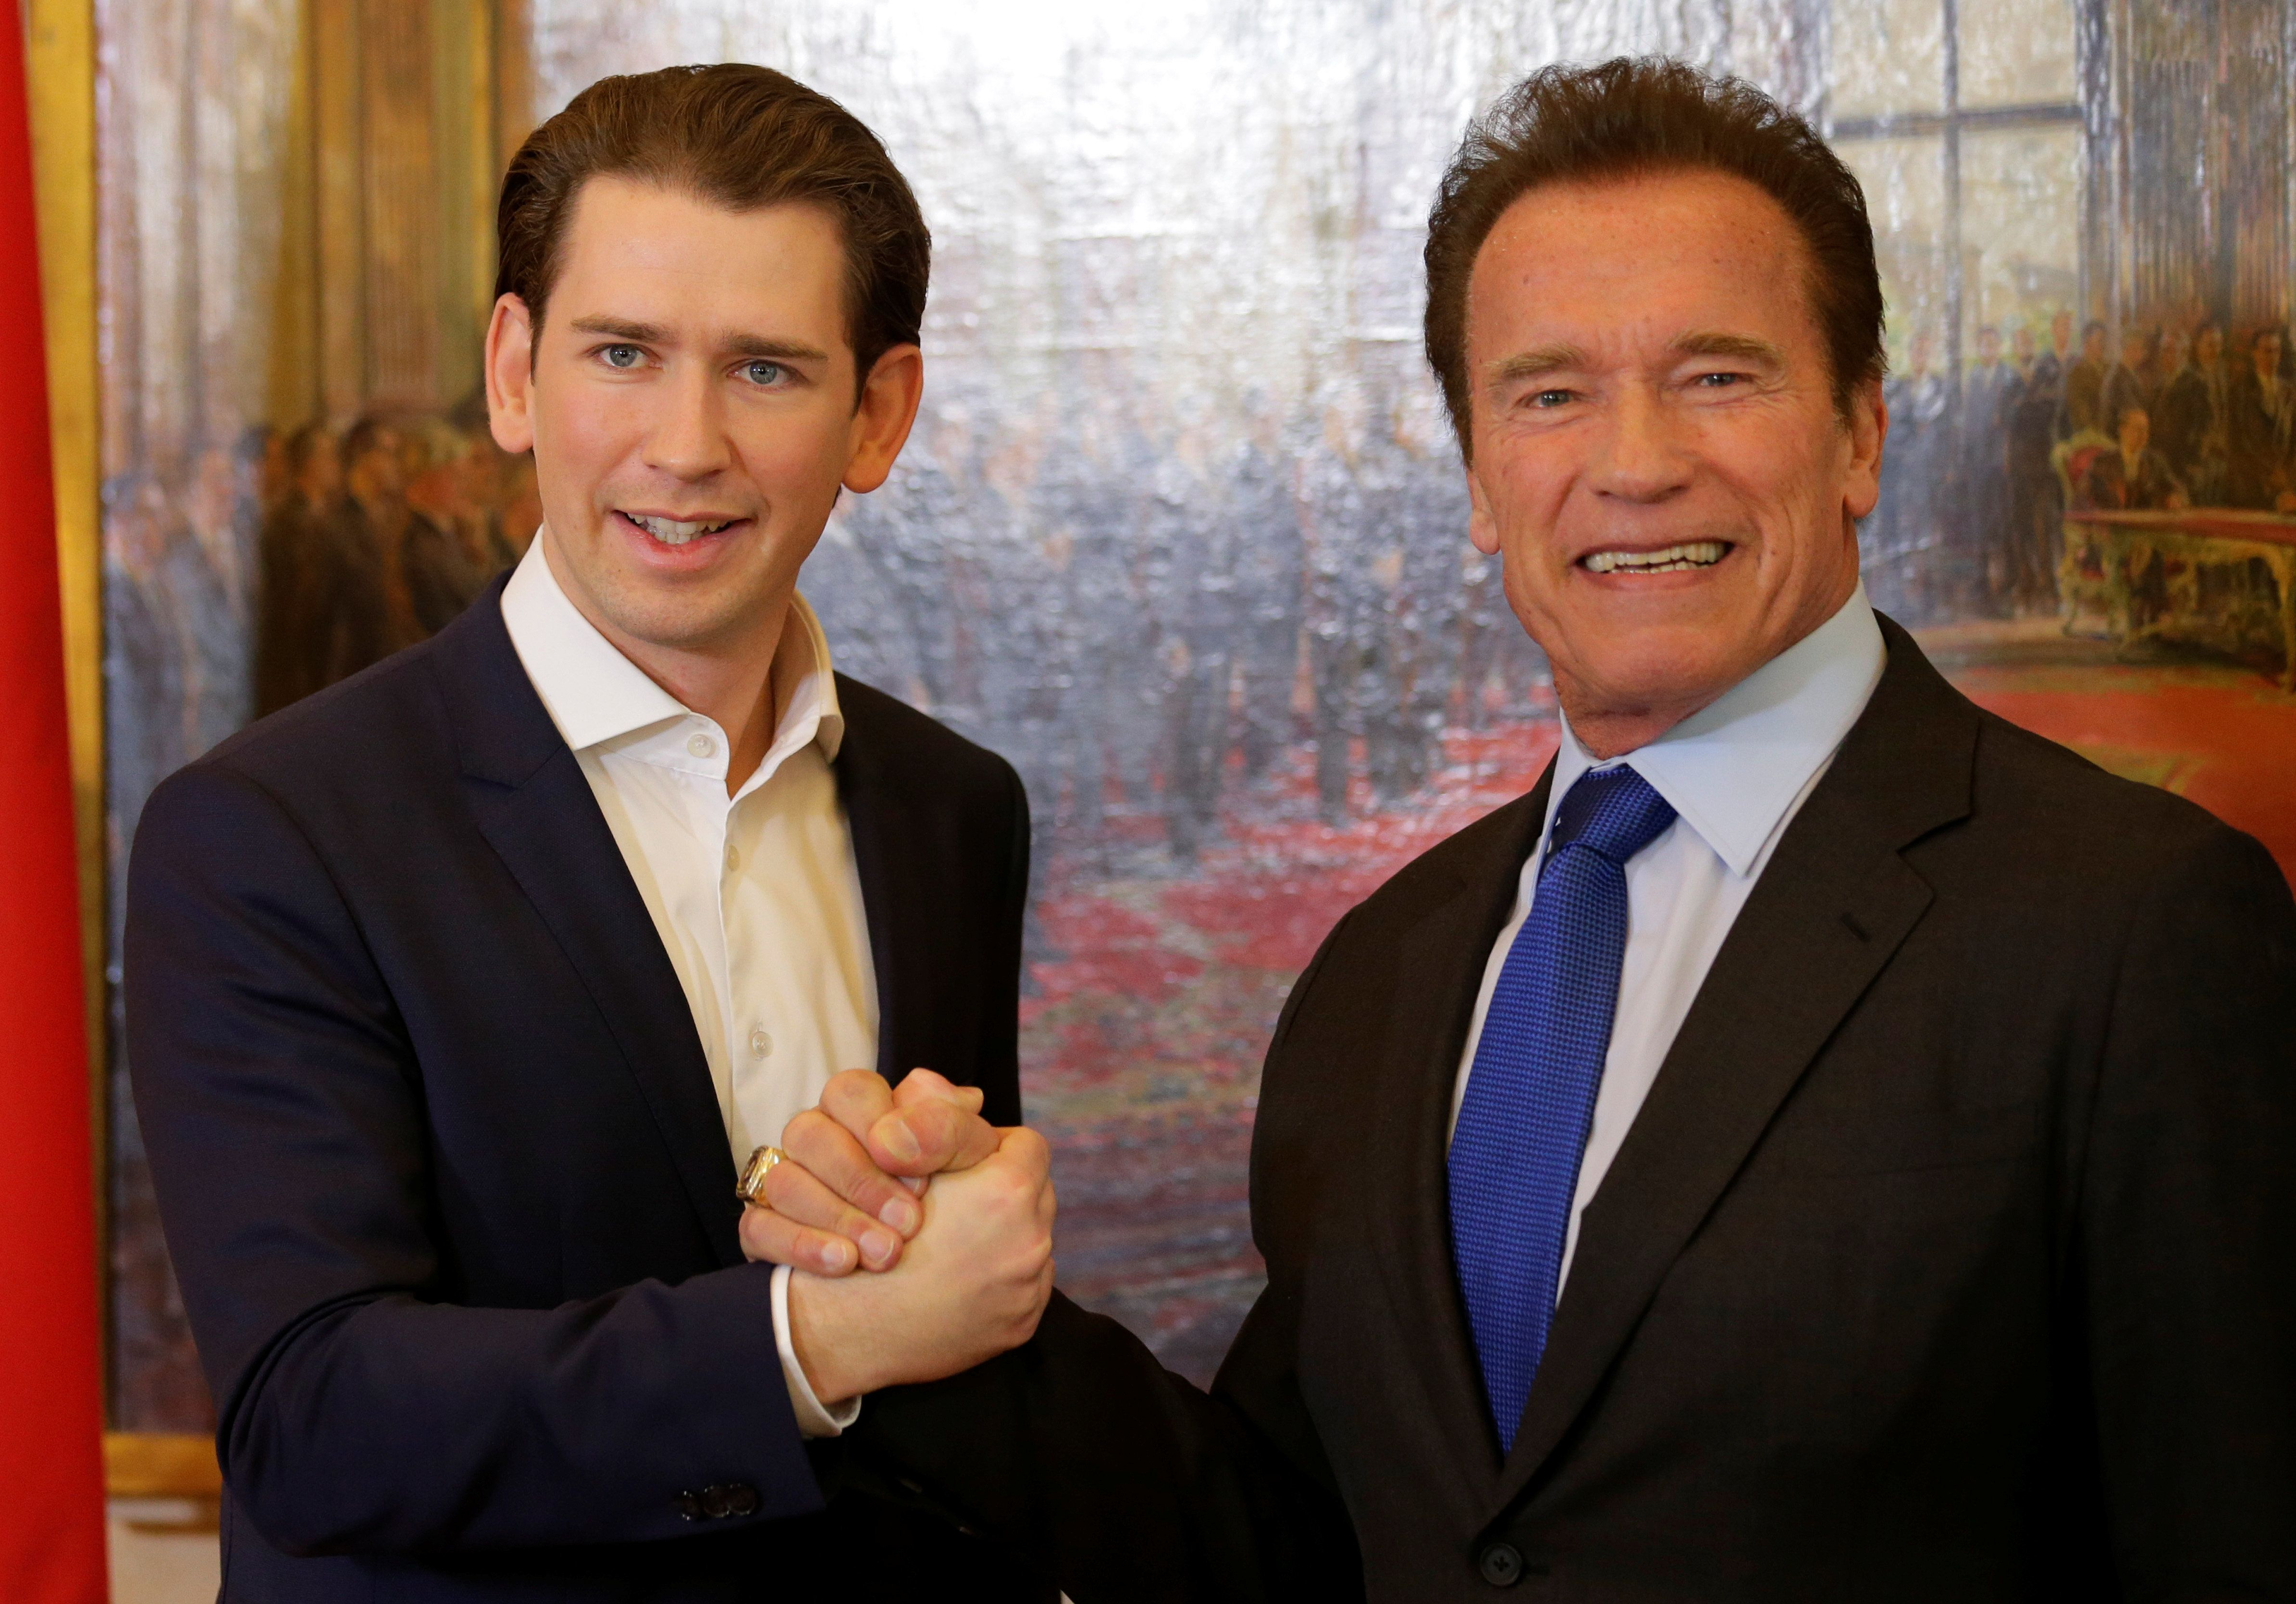 Austrian Chancellor Sebastian Kurz welcomes actor Arnold Schwarzenegger in his office in Vienna, Austria January 24, 2018.  REUTERS/Heinz-Peter Bader